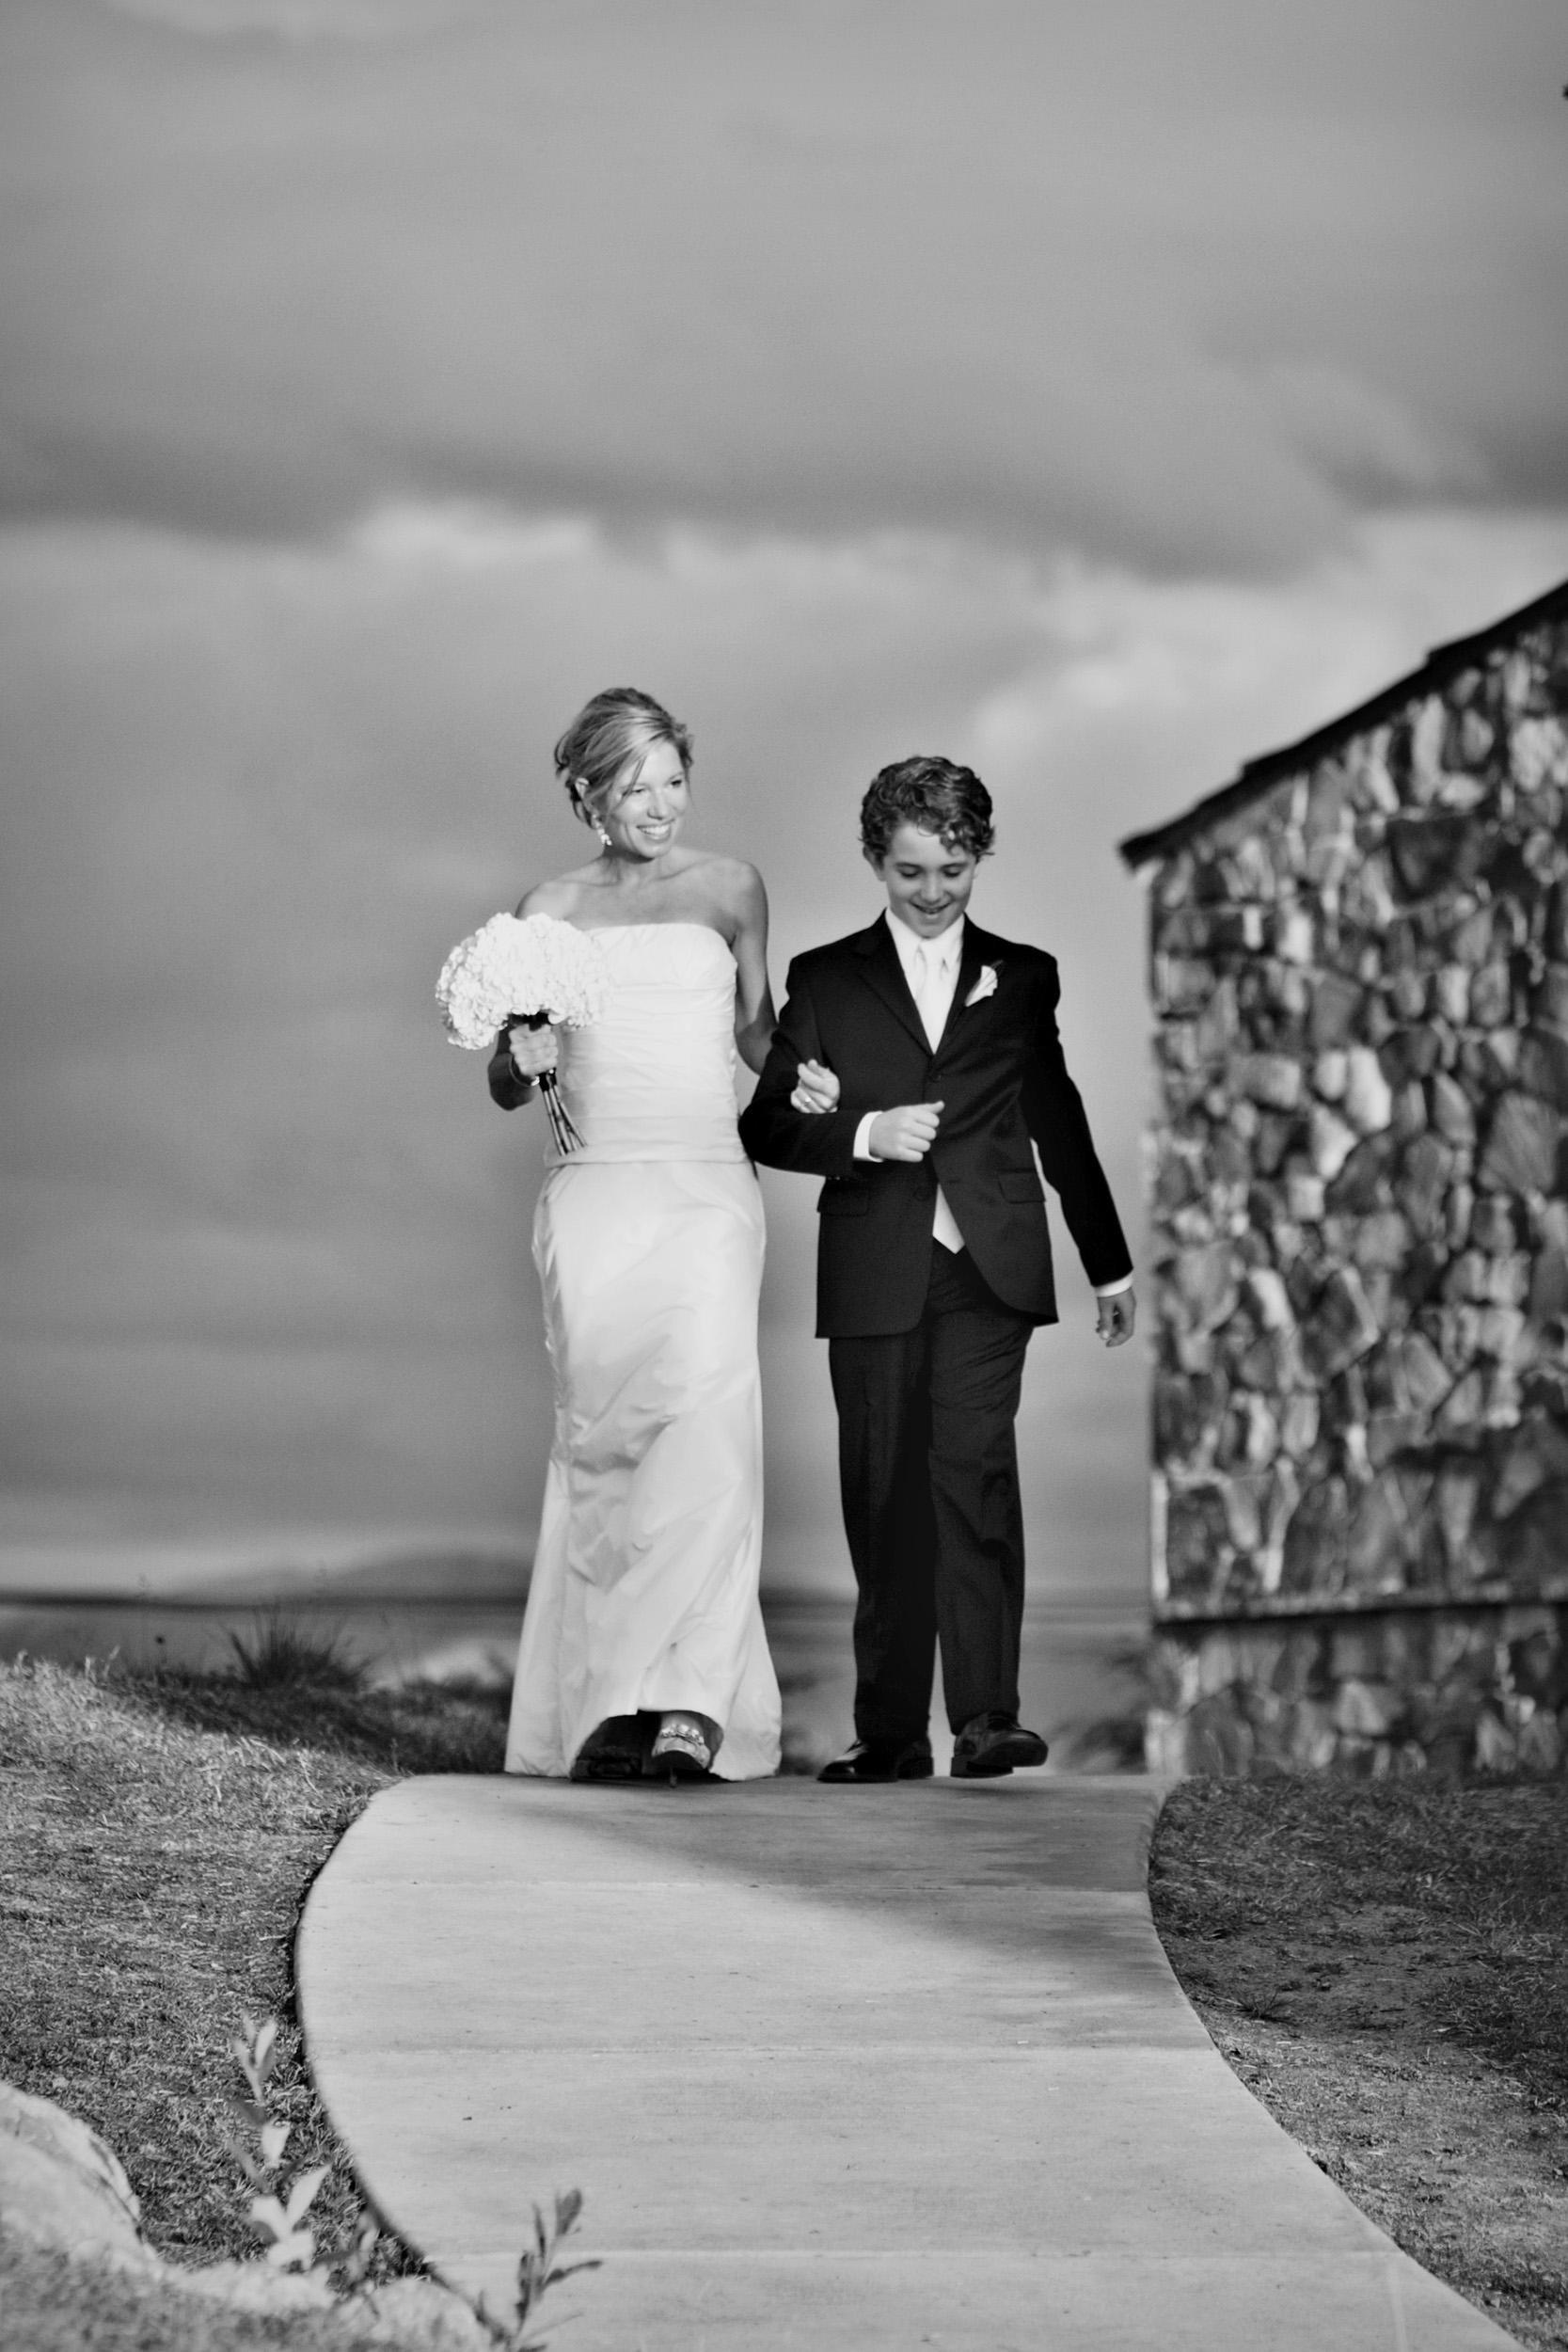 aspen-wedding-deck-026.jpg